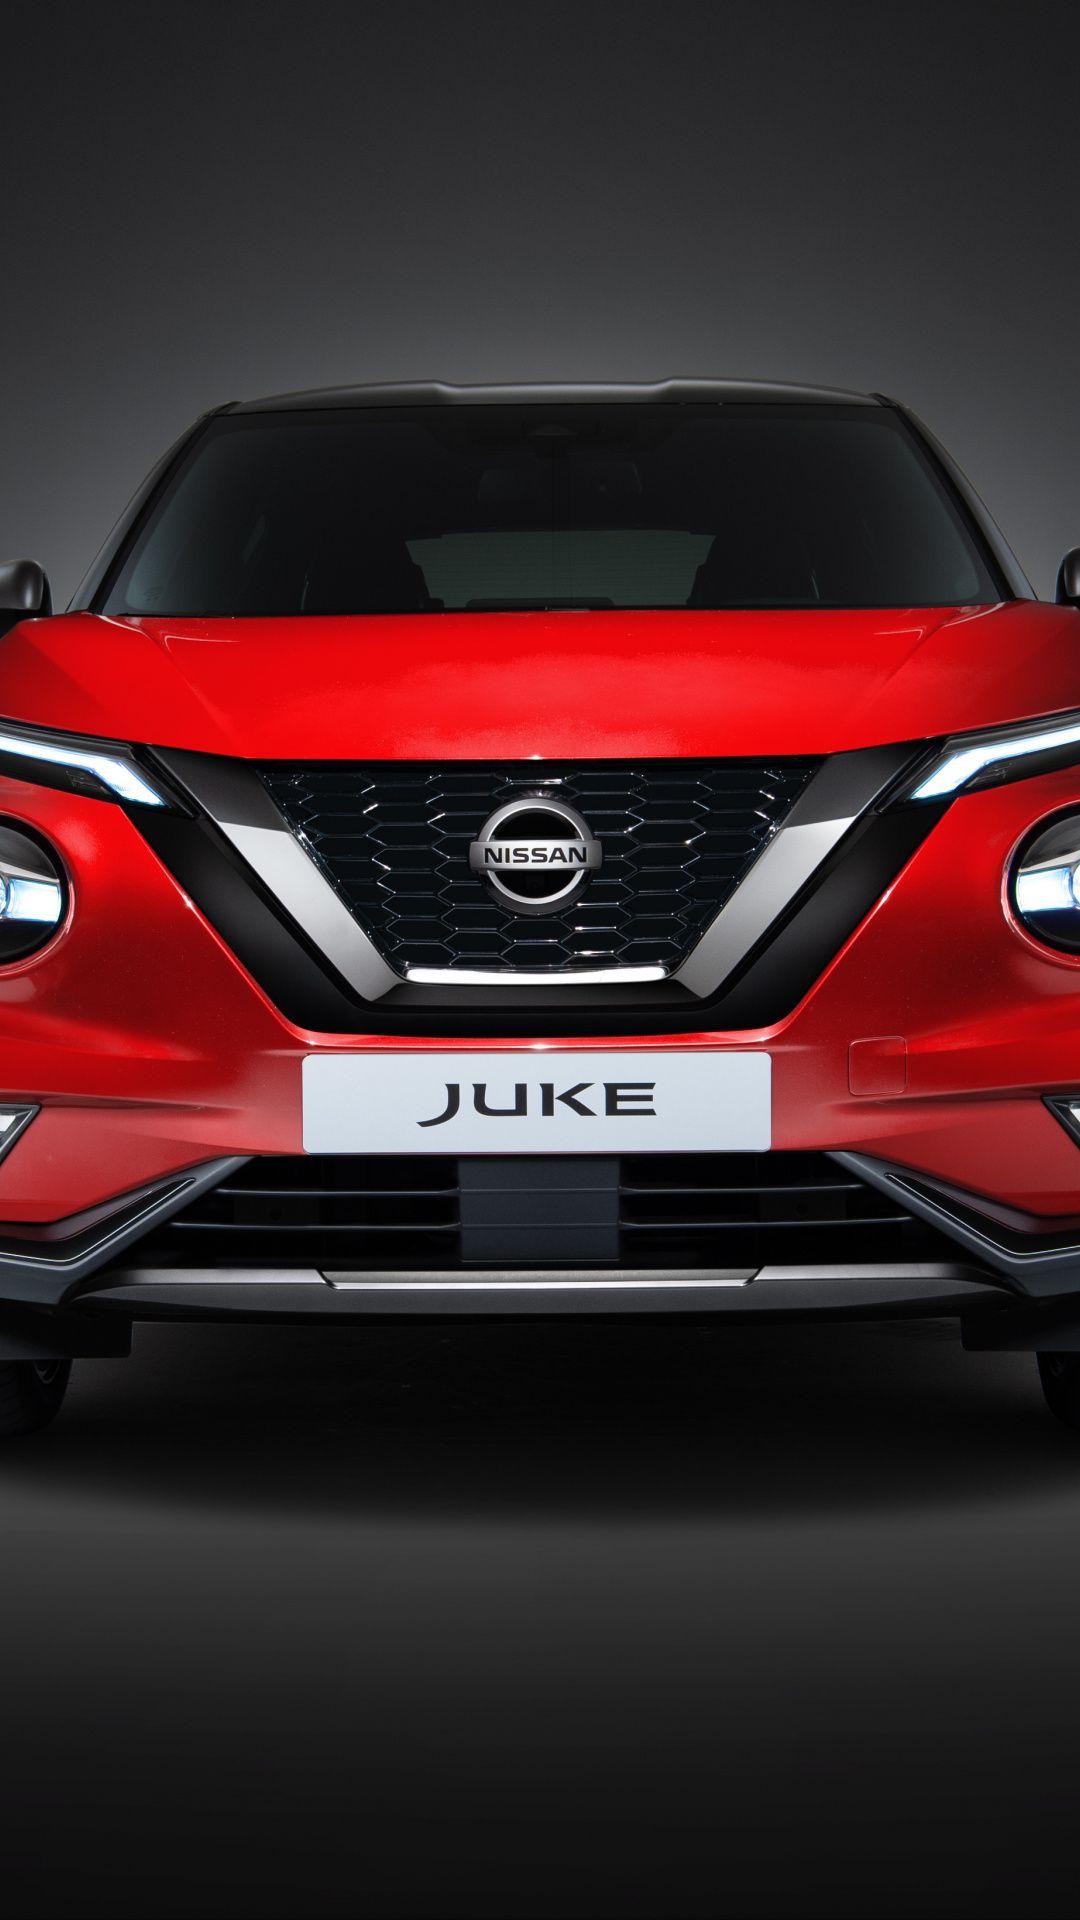 1080x1920 Nissan Juke Red Car 2019 Wallpaper Nissan Juke